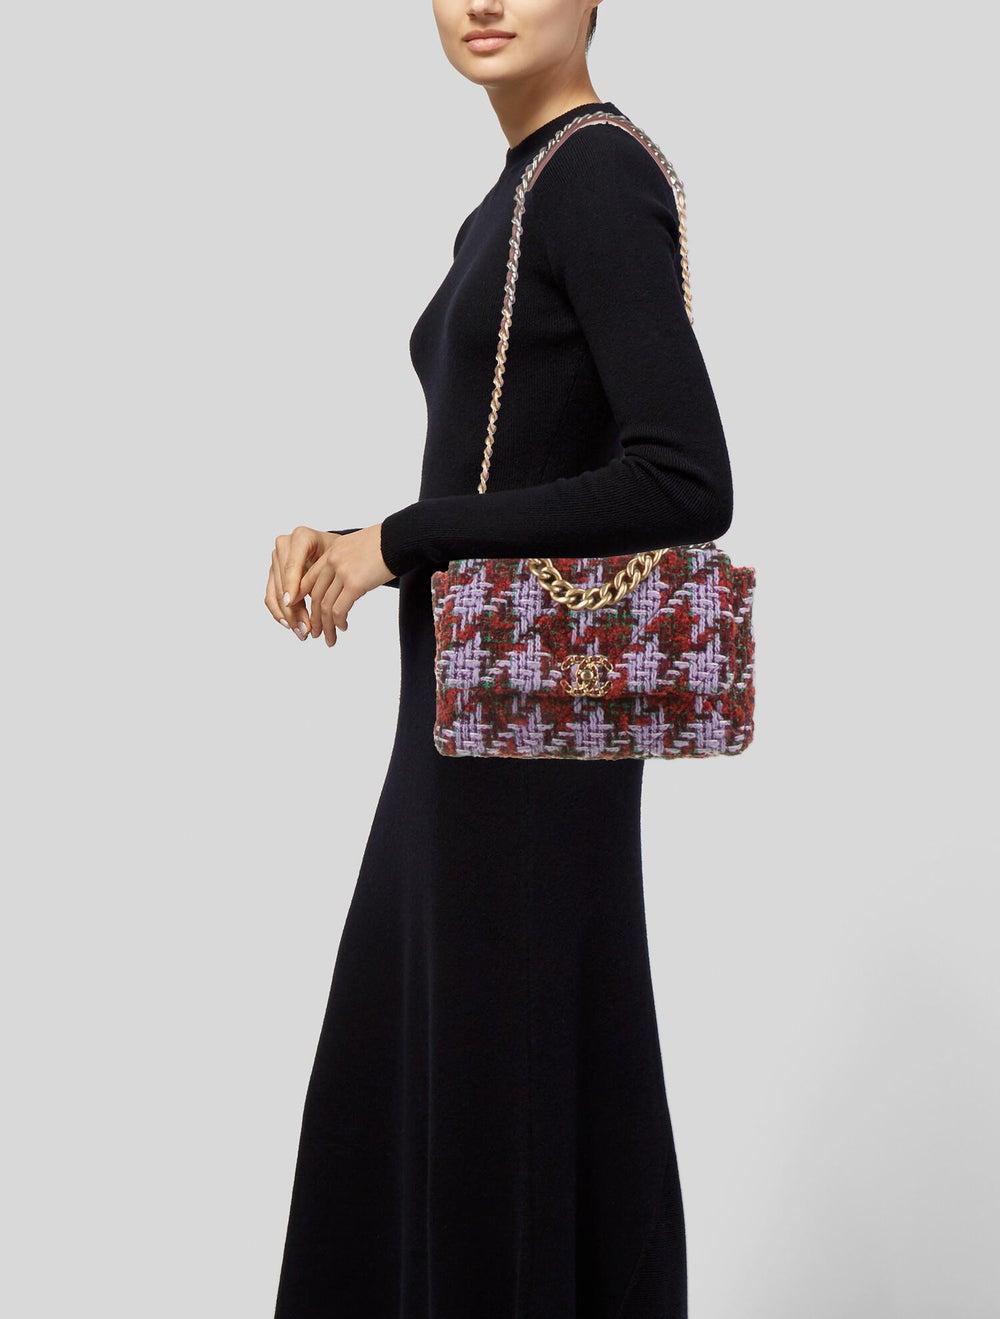 Chanel 2020 Large Tweed 19 Flap Bag Green - image 2